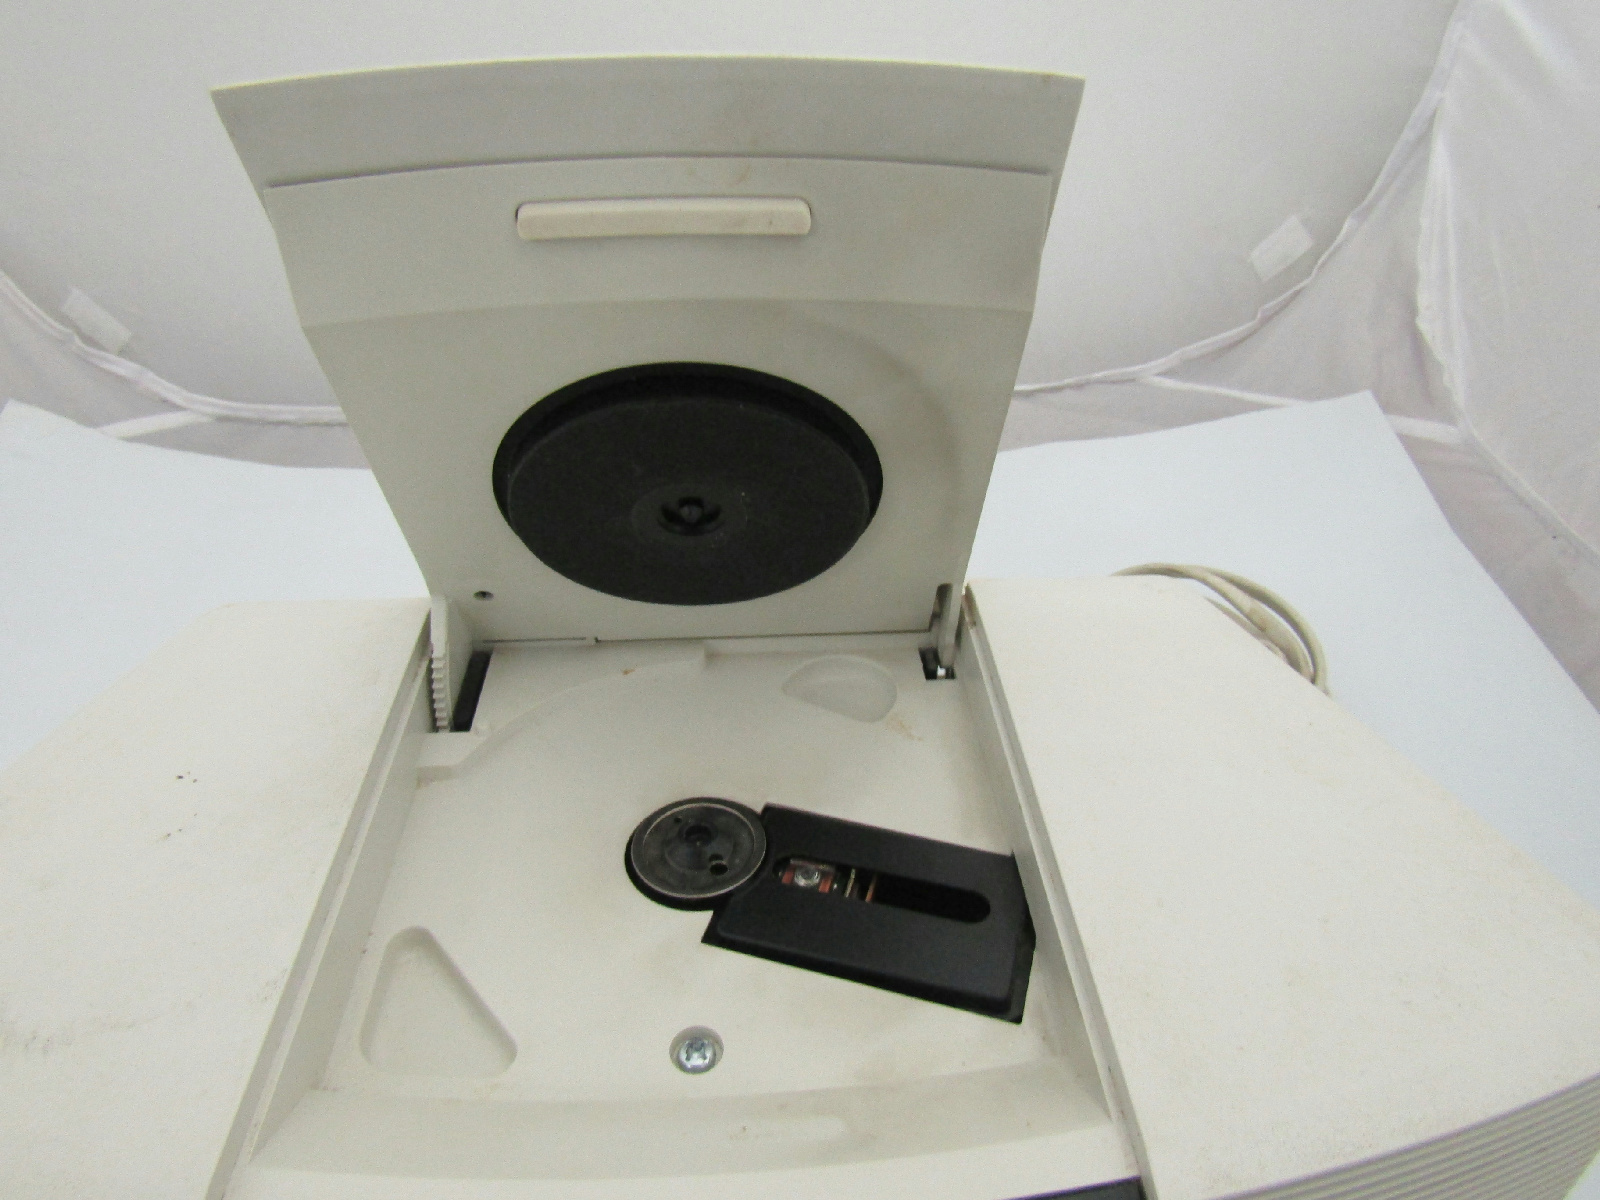 bose wave radio cd player alarm clock white model awrc 1p ebay. Black Bedroom Furniture Sets. Home Design Ideas